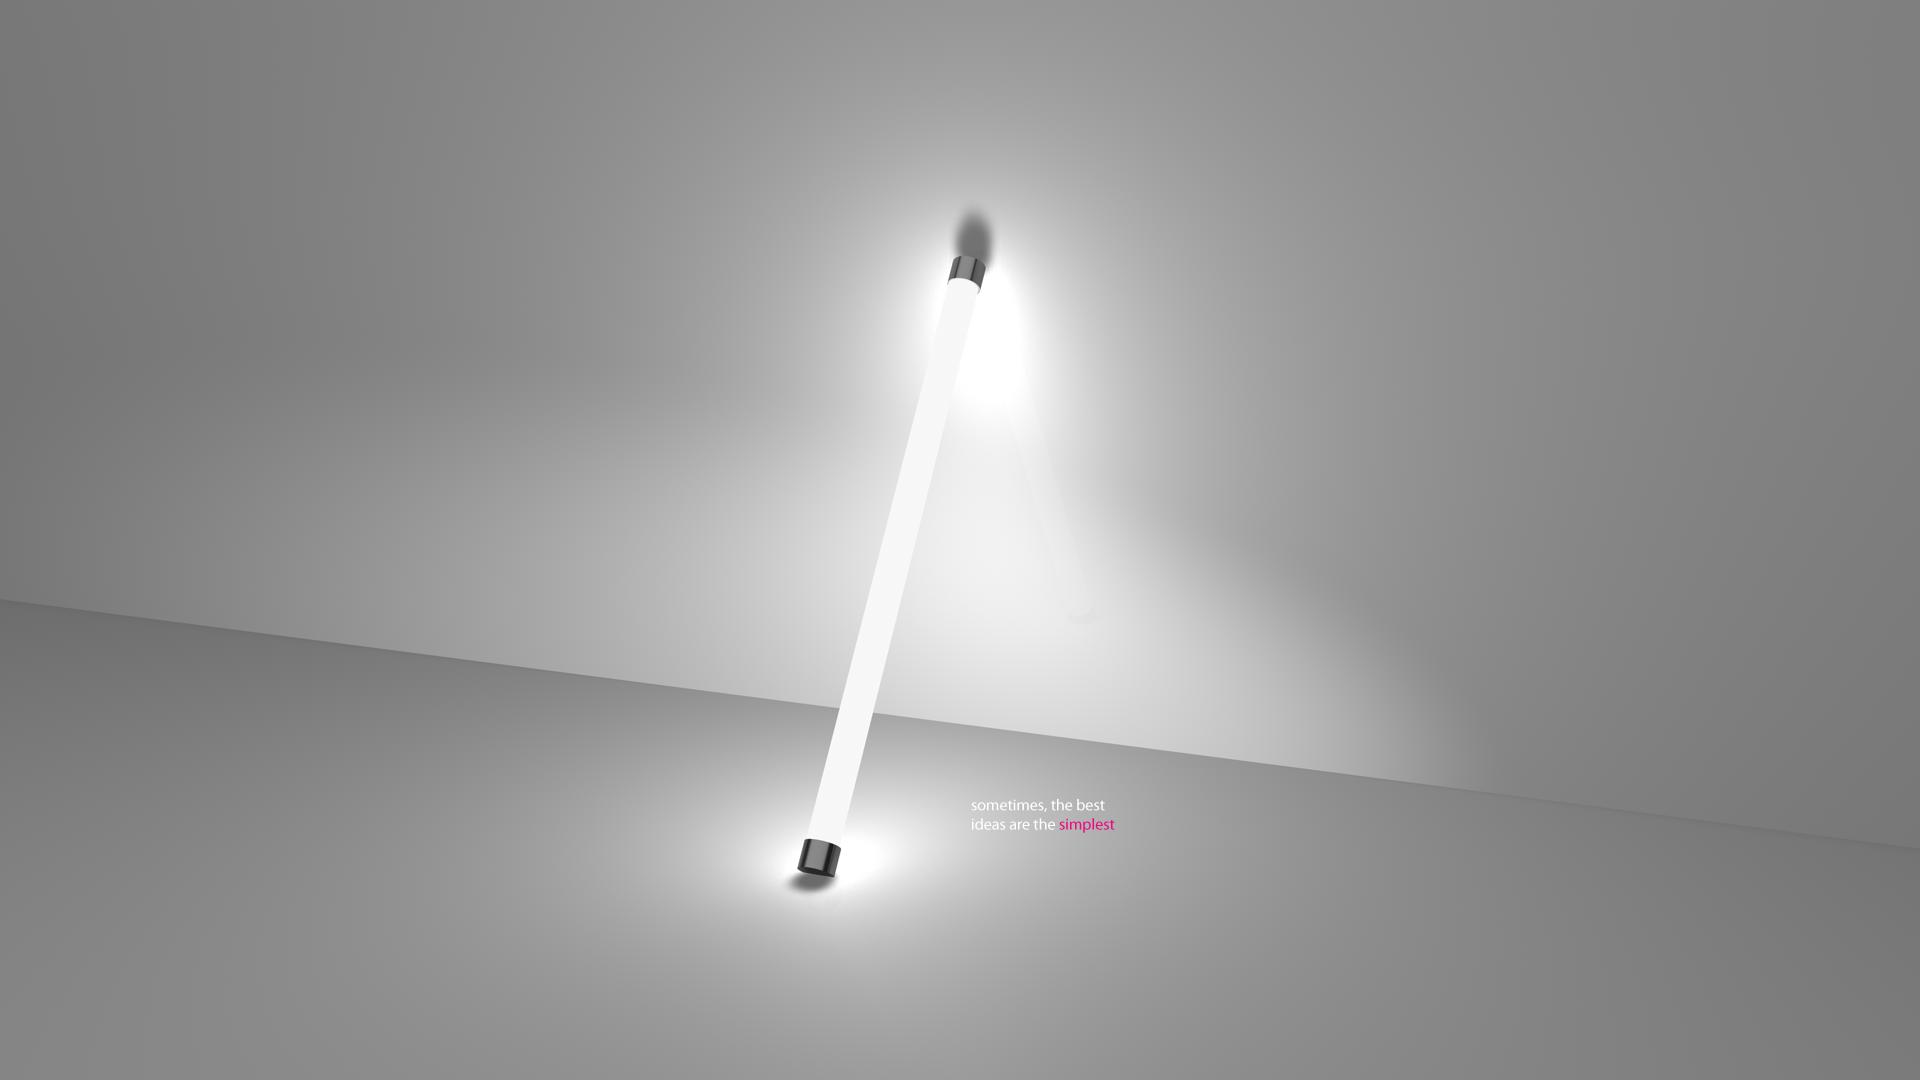 idea lightbulb light text quotes statement motivation